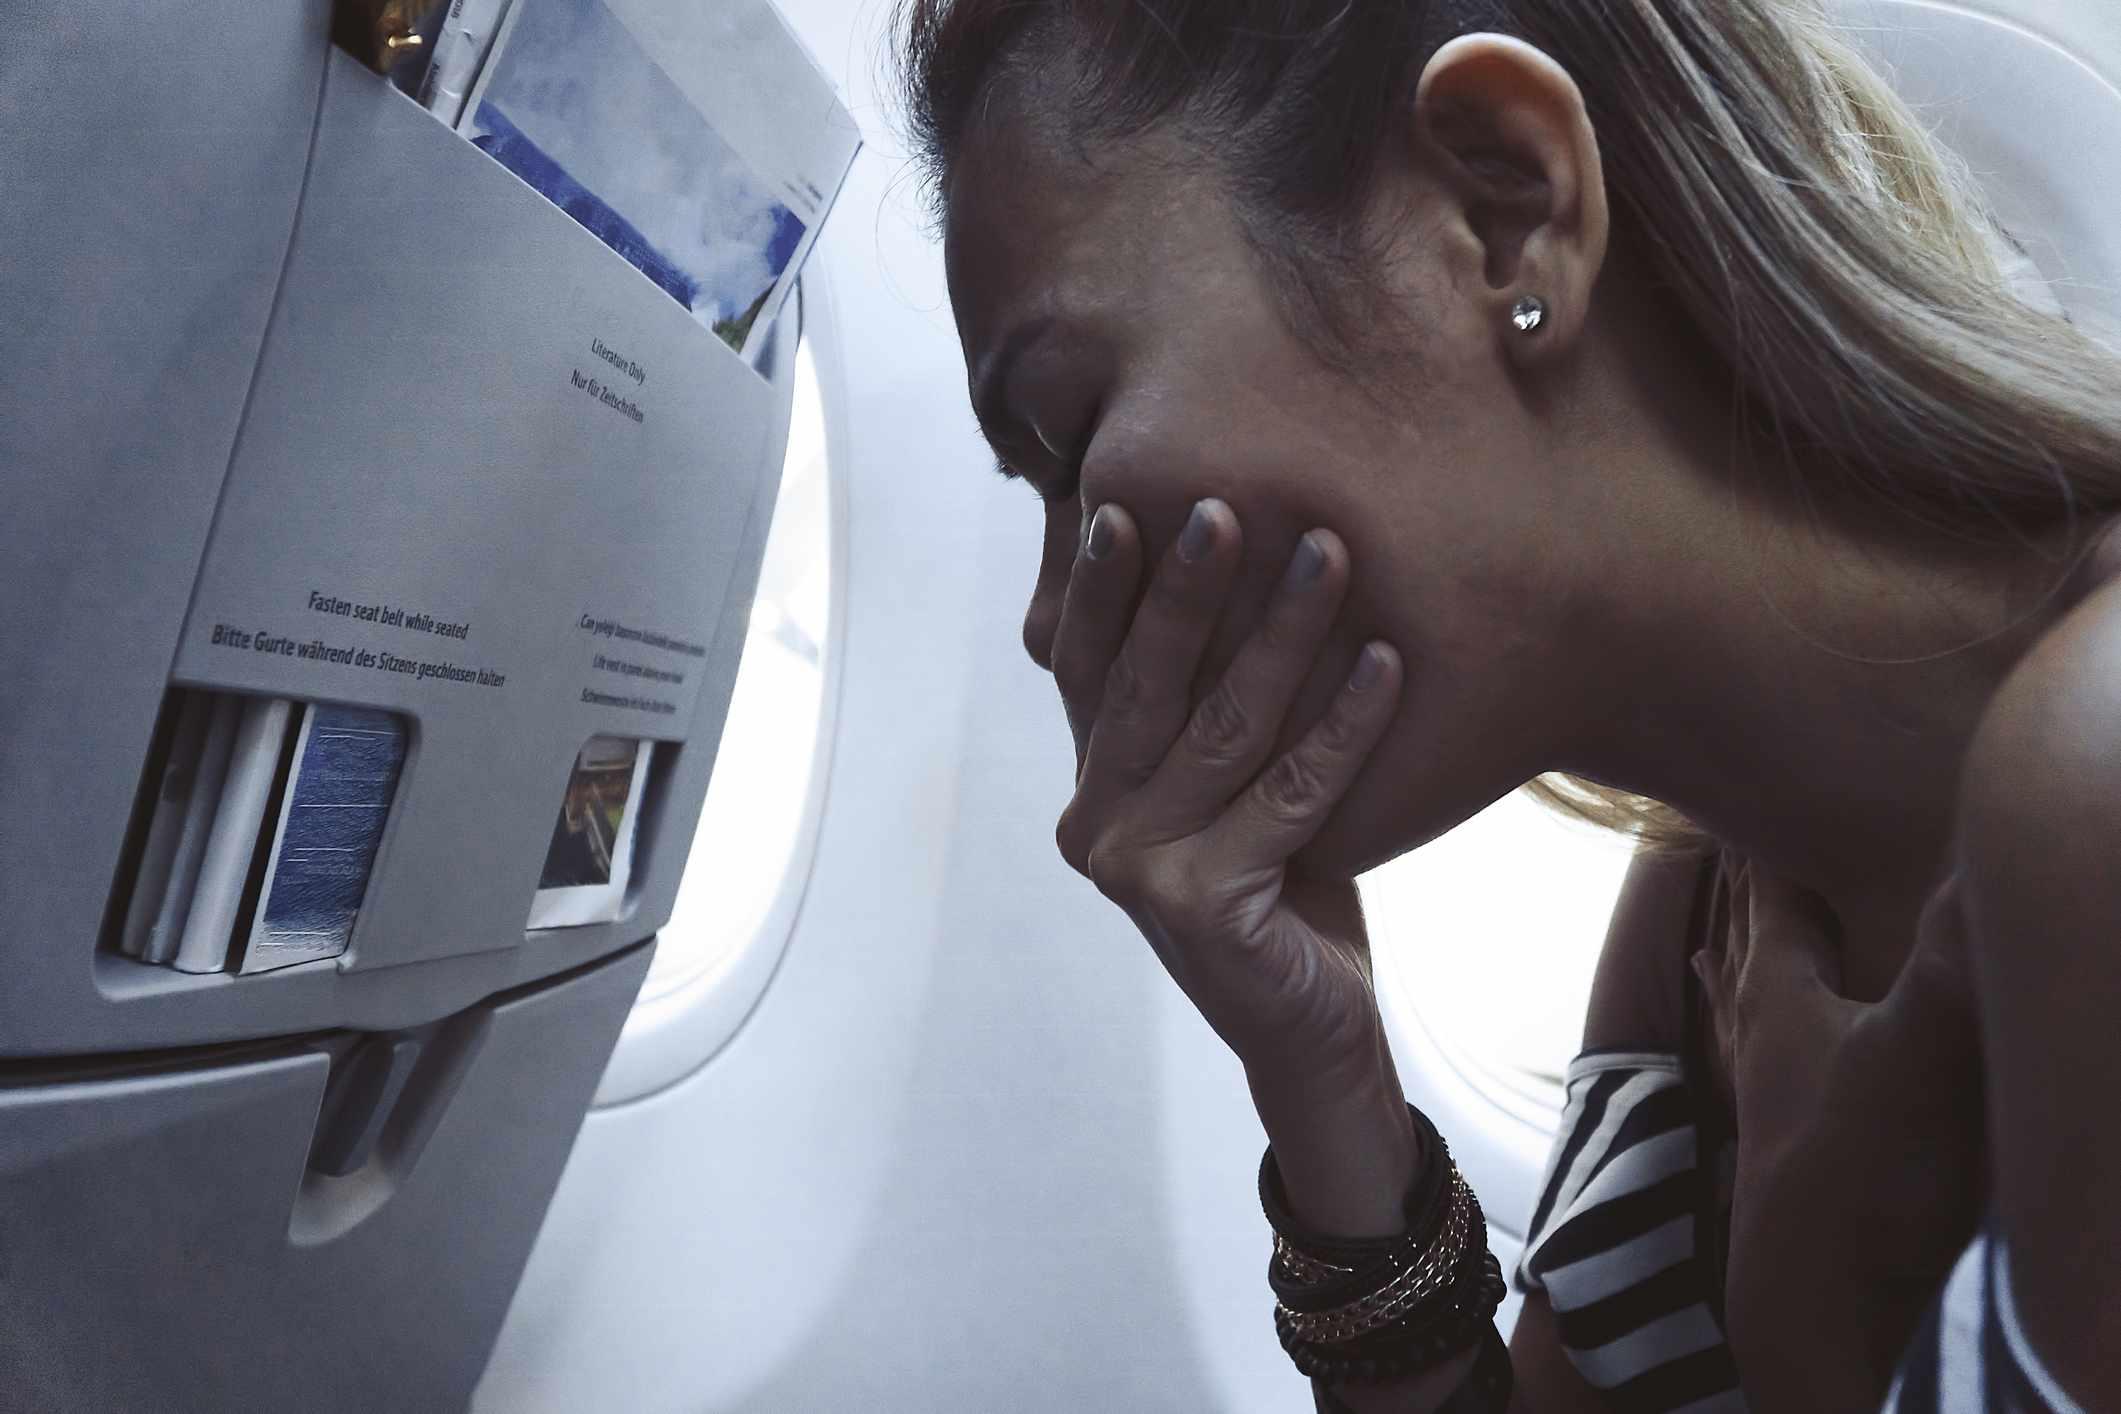 Woman on a plane feeling nauseous